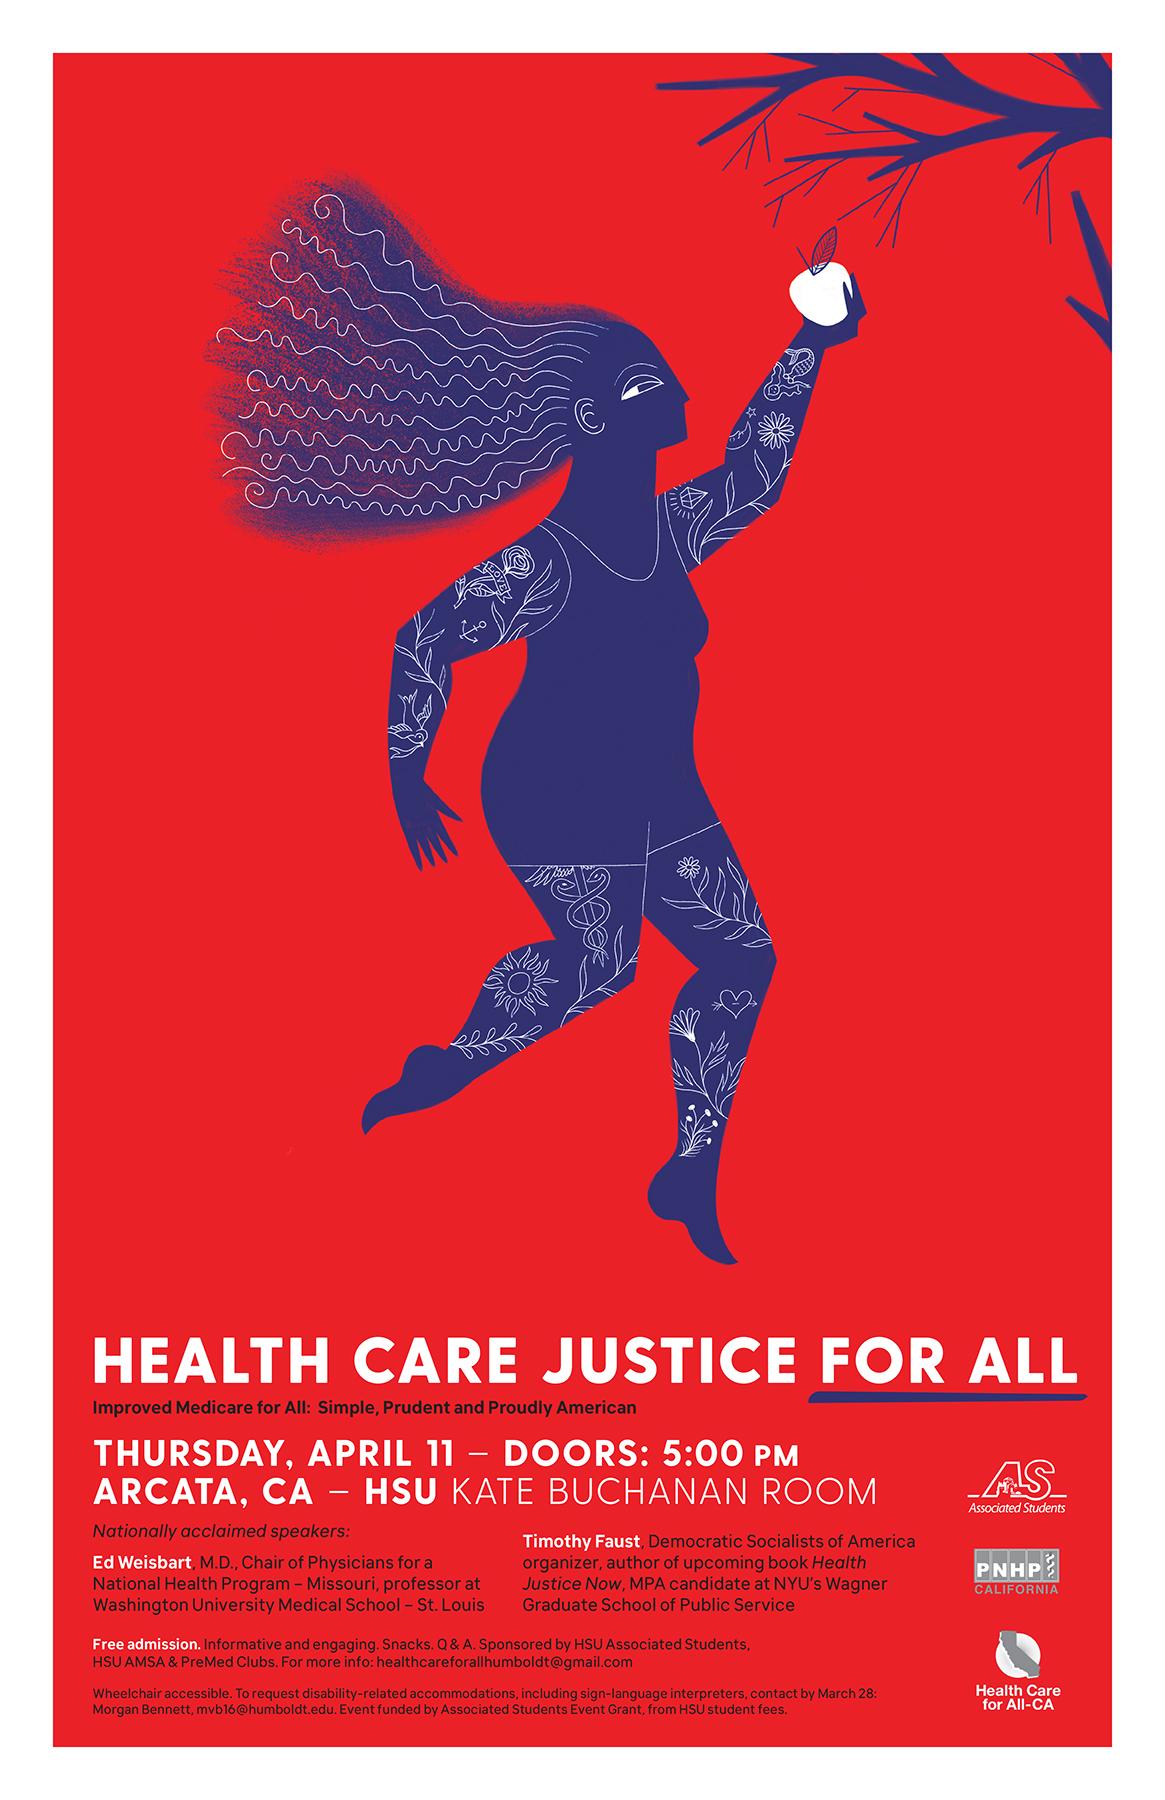 HealthCareJustice Poster screen.jpg